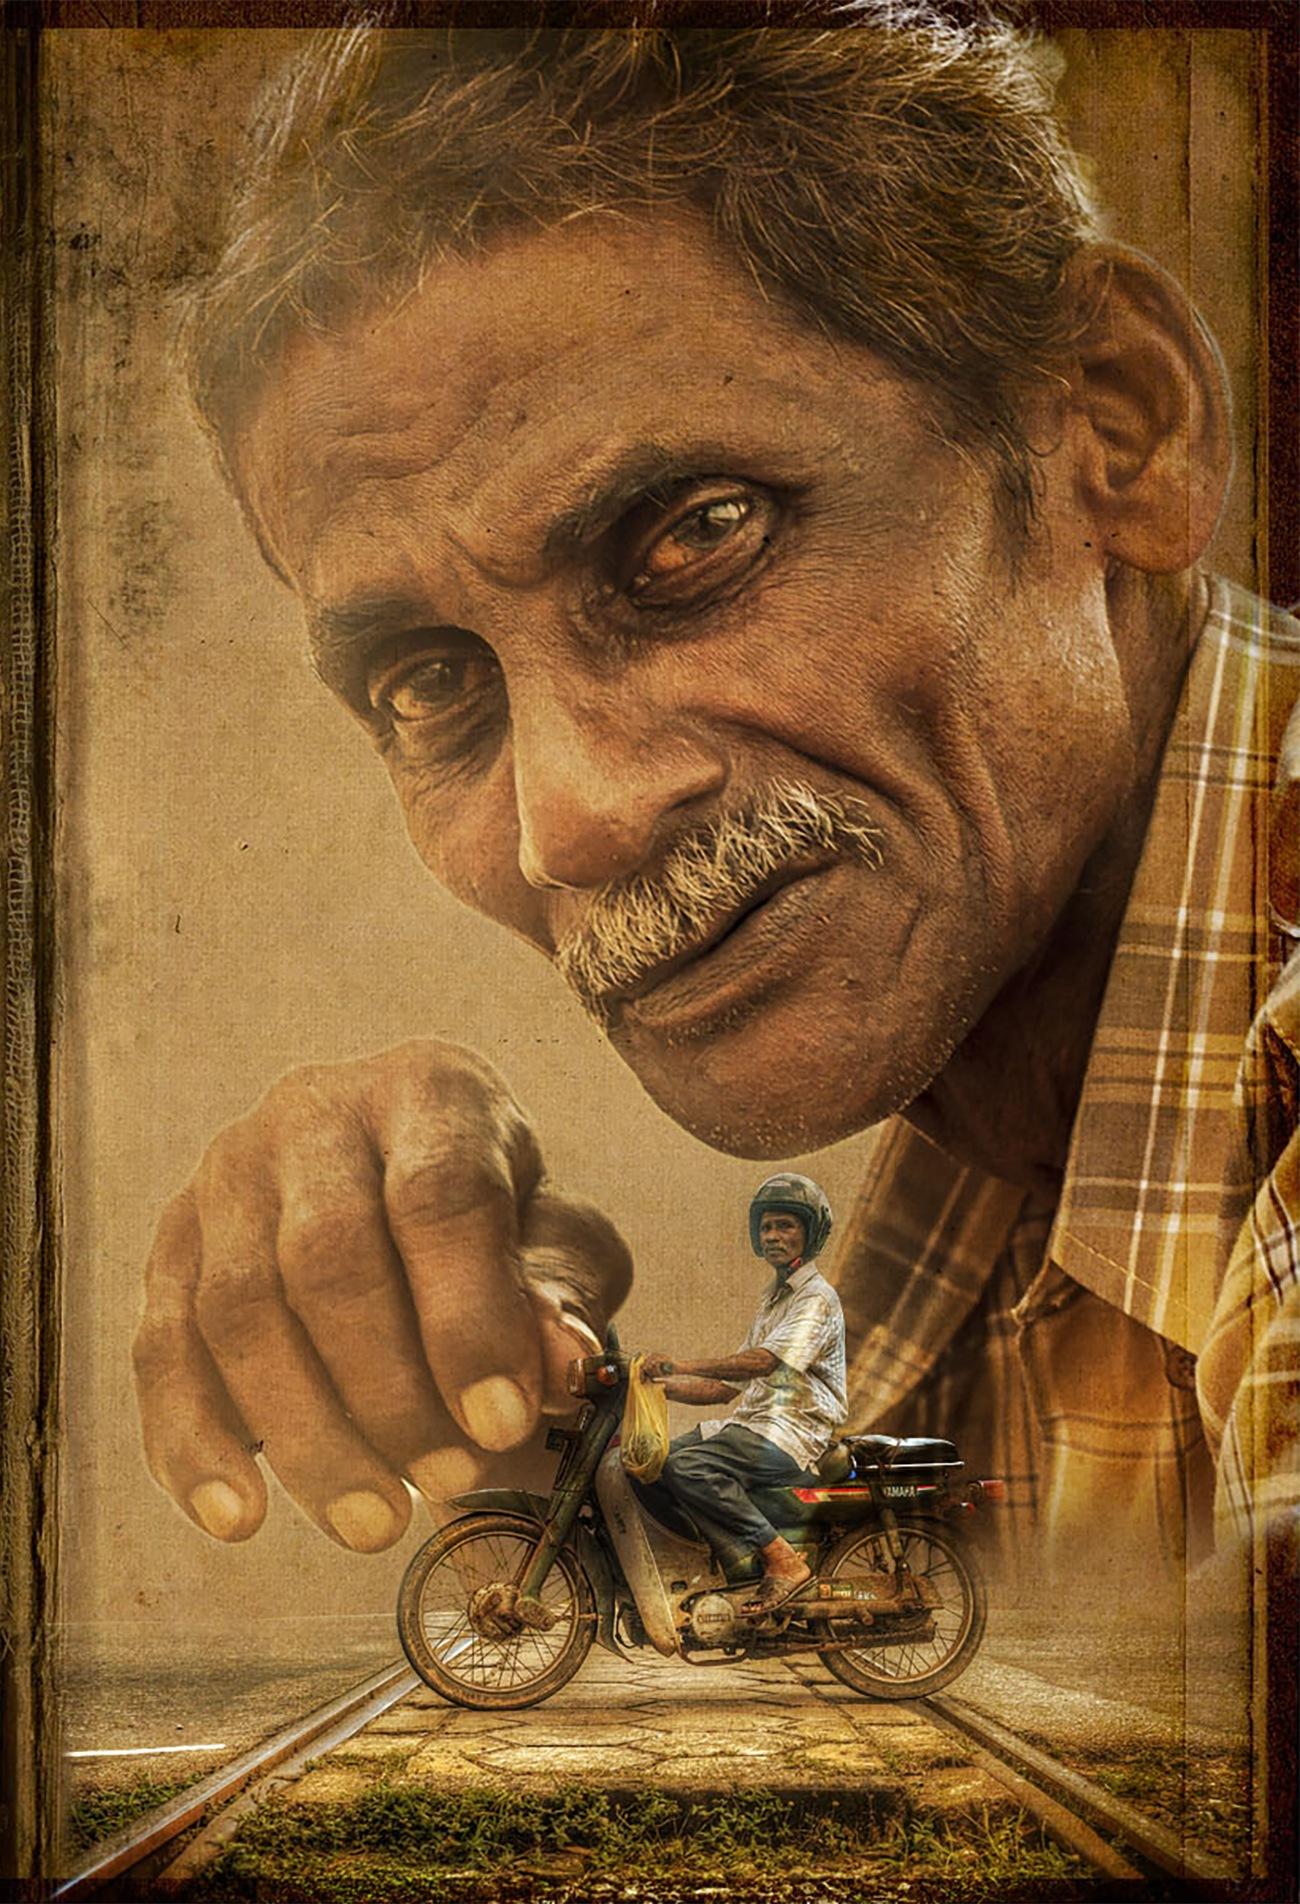 People of Galle   eBook by Piotr Cwiklinski